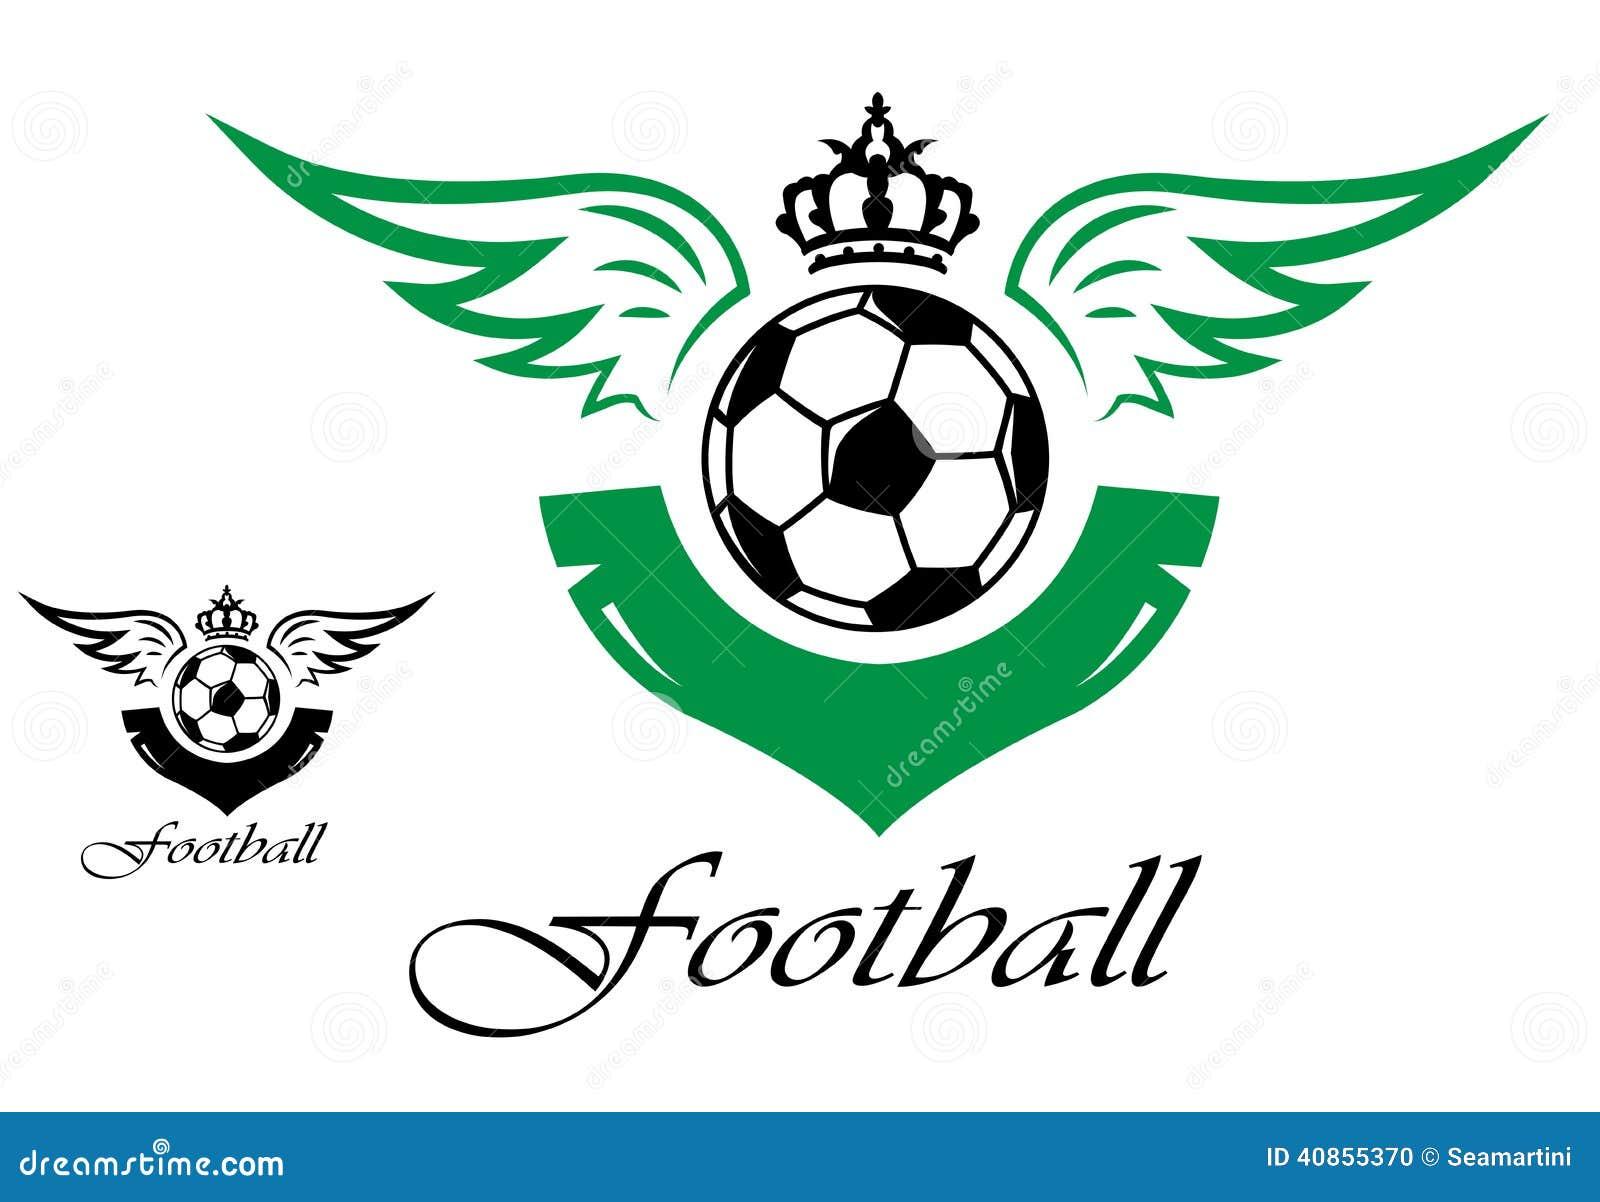 Football or soccer symbol stock vector illustration of design football or soccer symbol buycottarizona